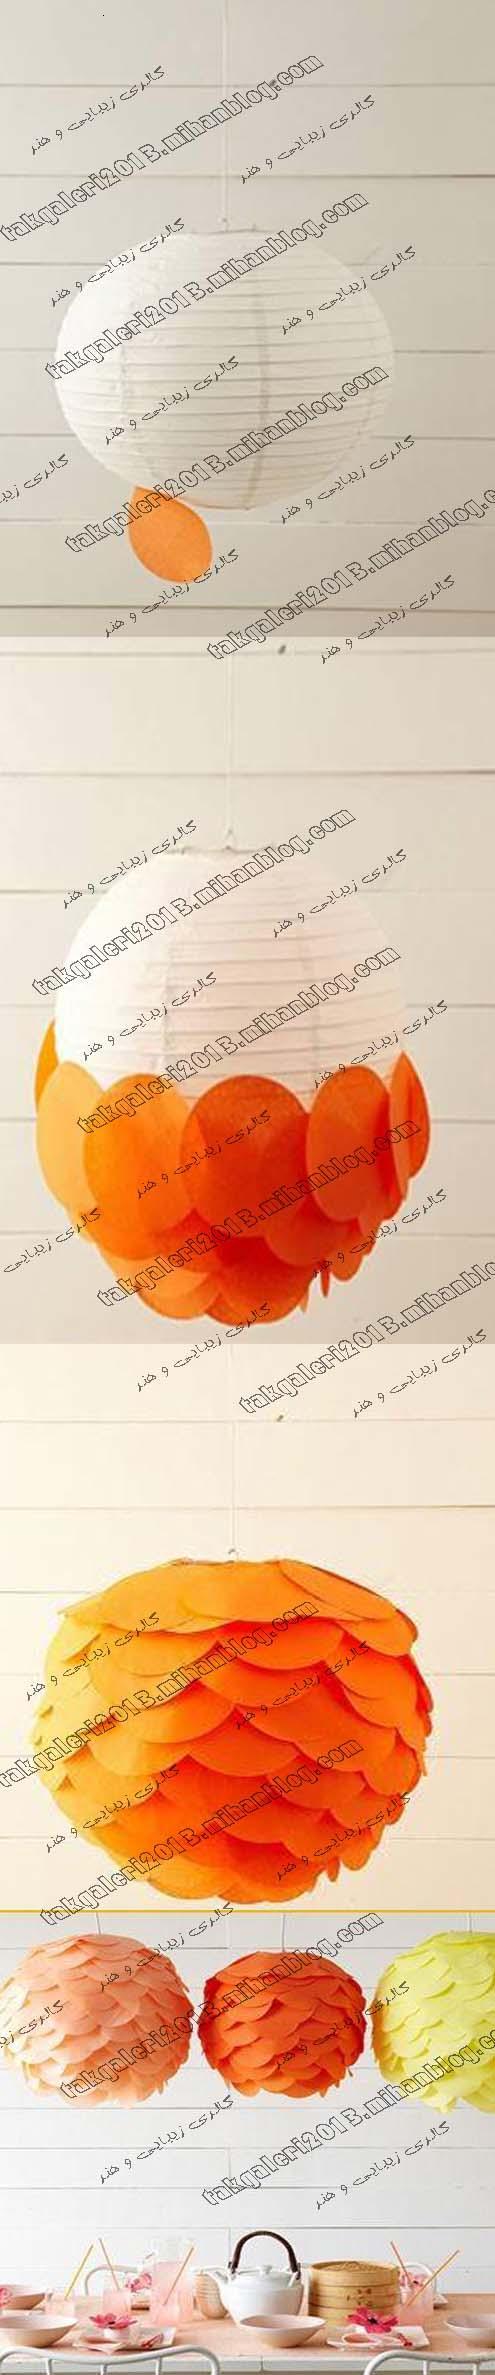 http://s1.picofile.com/file/7978785806/tak_shikoi_3_.jpg